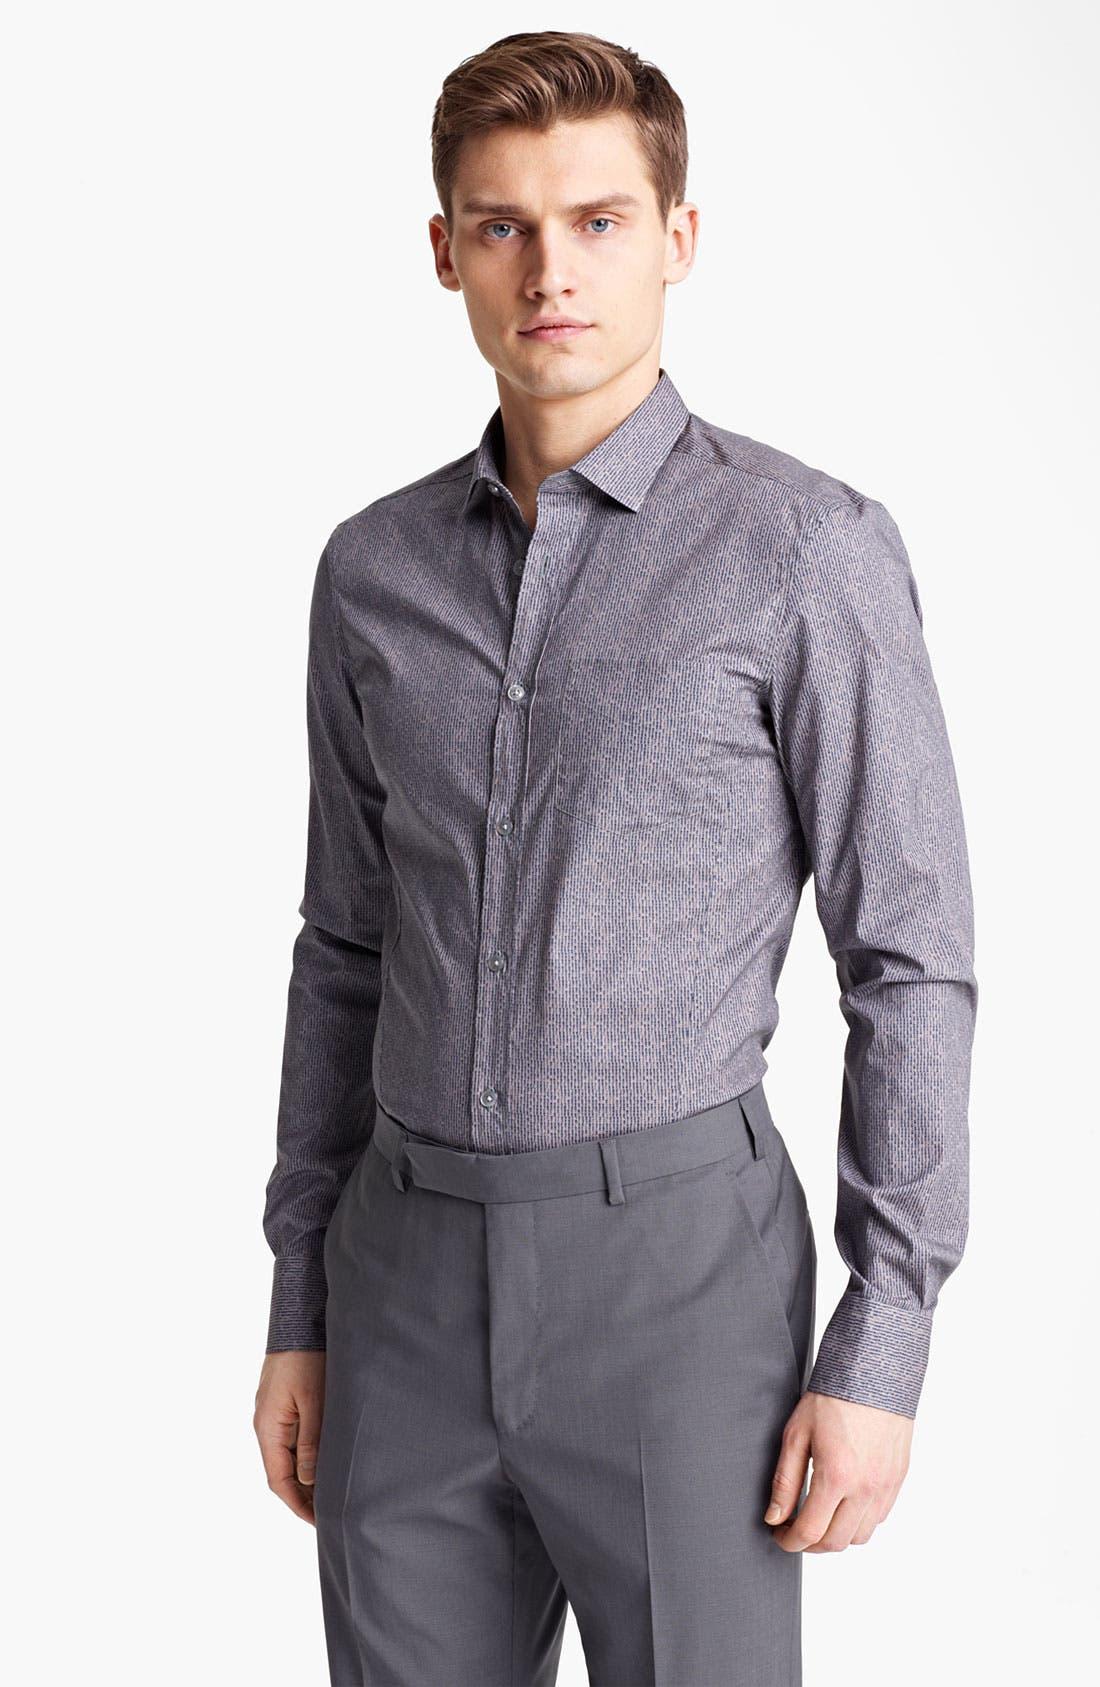 Alternate Image 1 Selected - Z Zegna Textured Print Dress Shirt